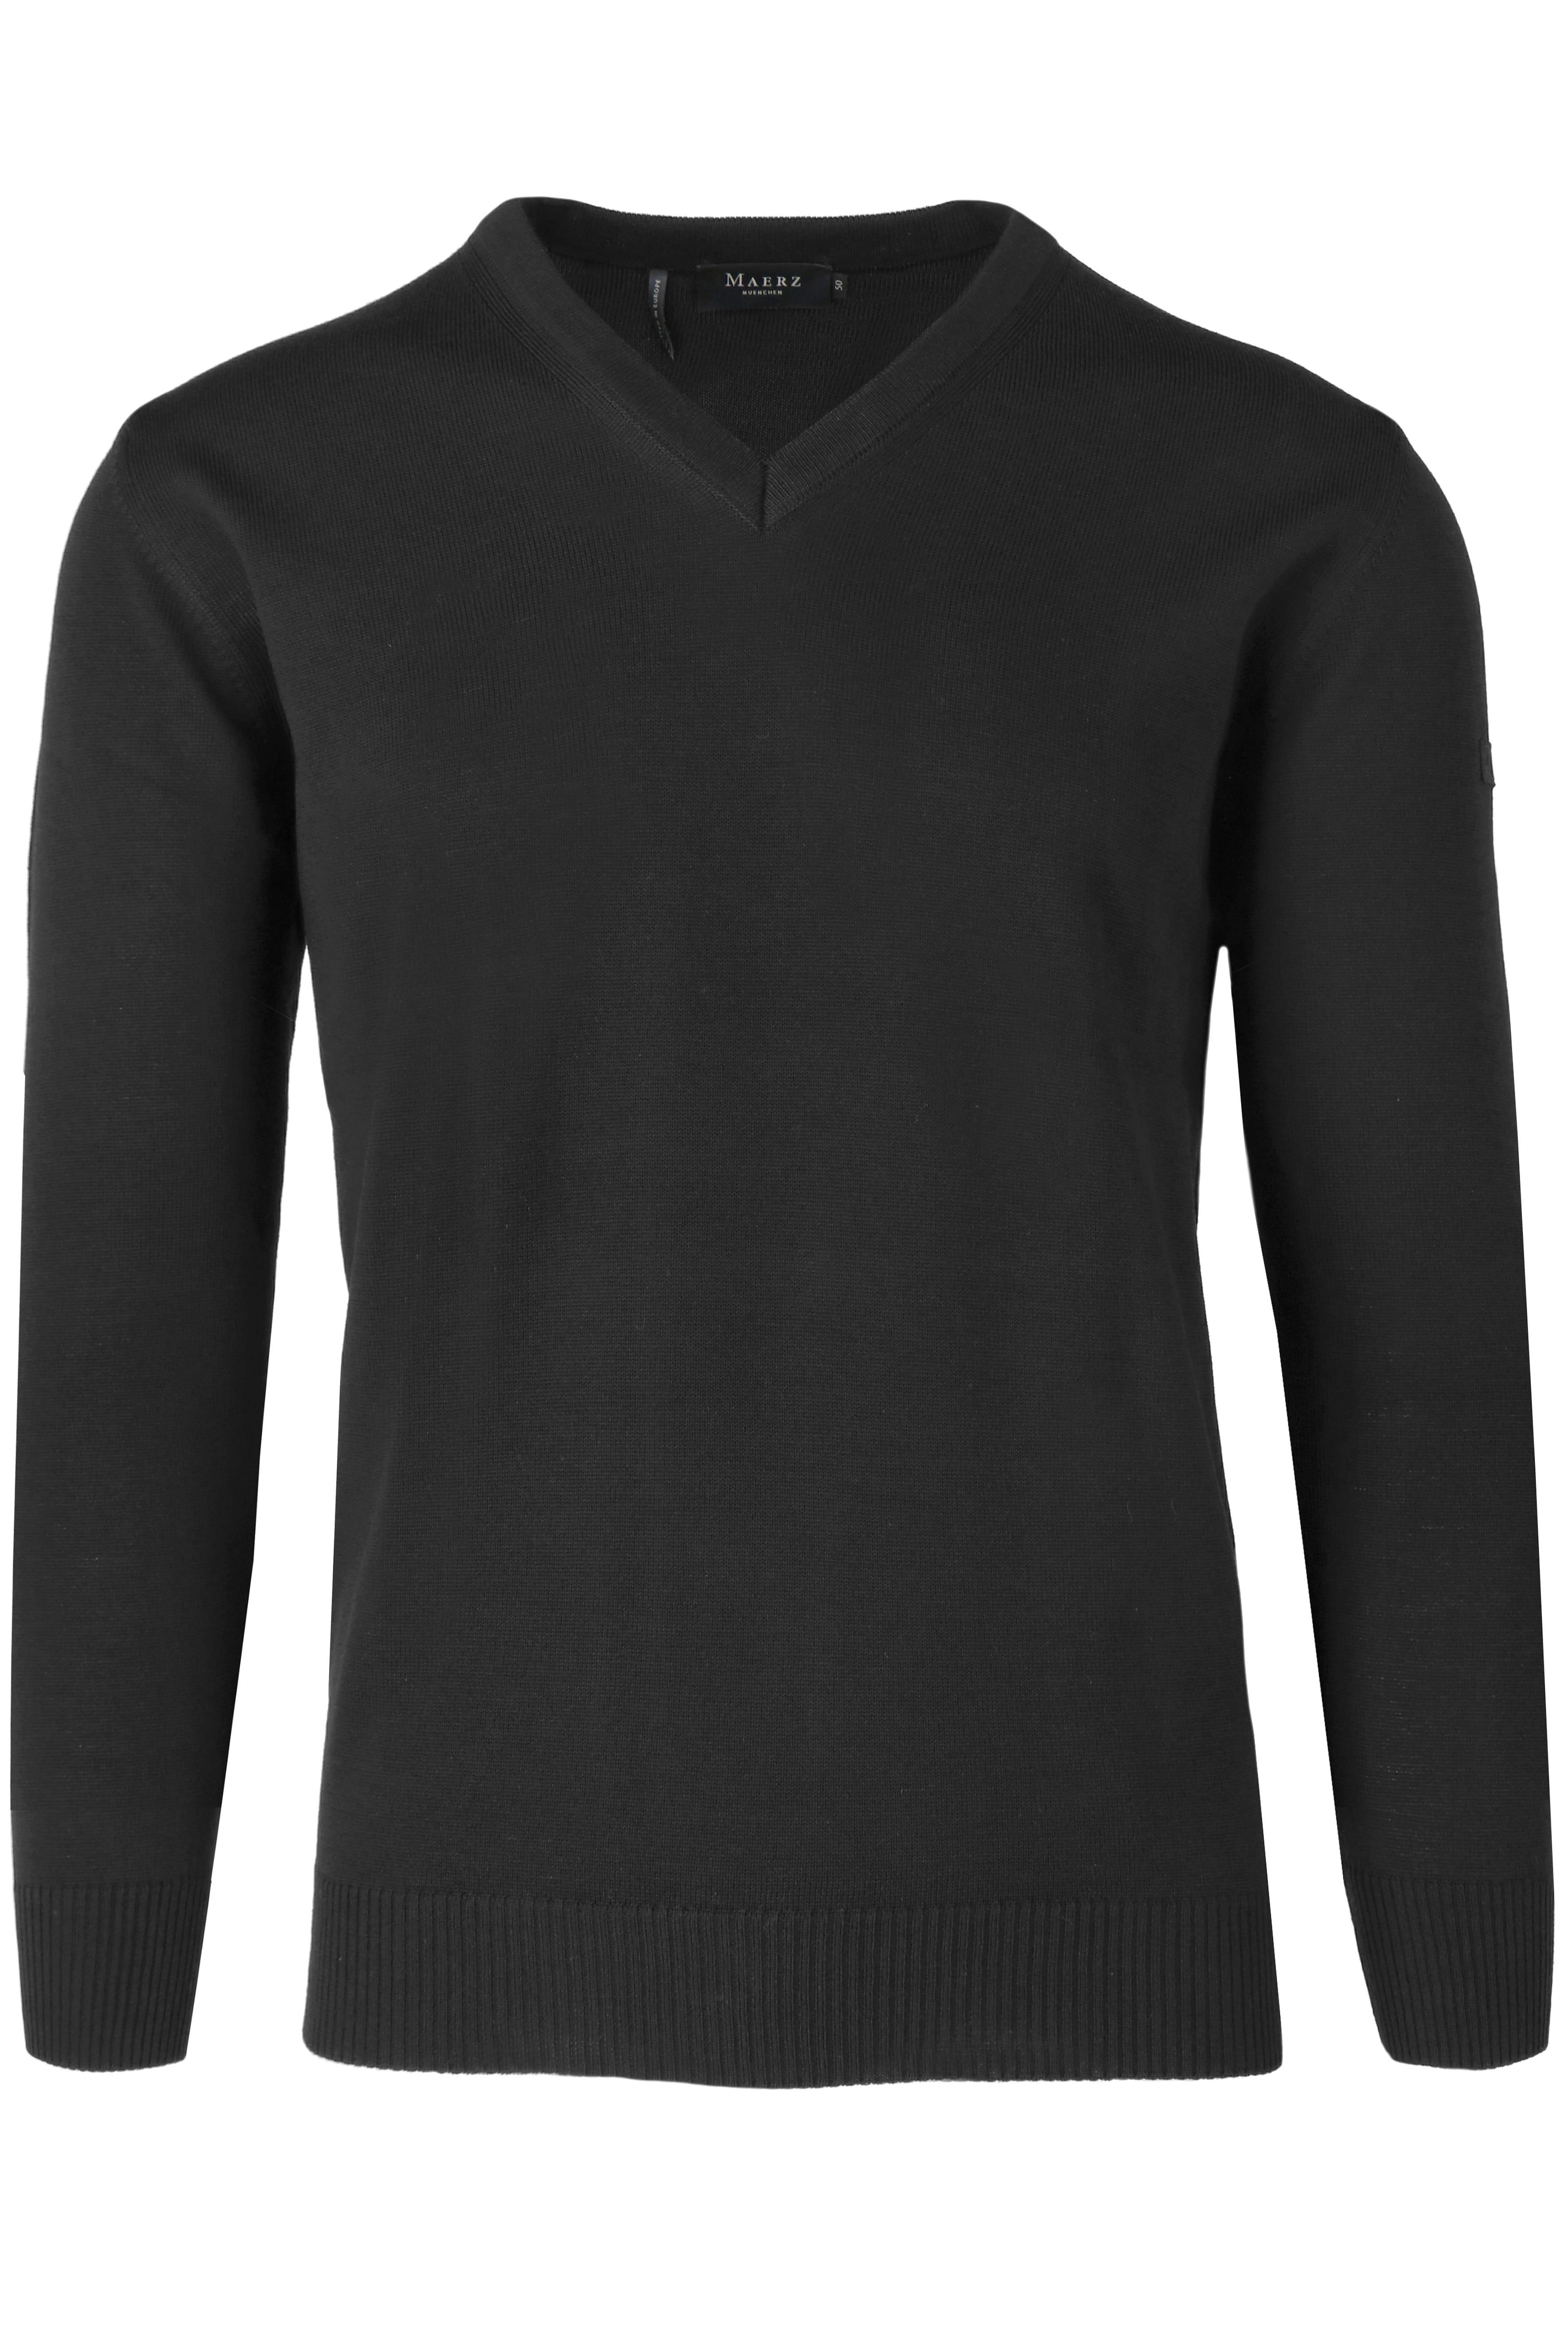 MAERZ Classic Fit Pullover V-Ausschnitt anthrazit, einfarbig 48